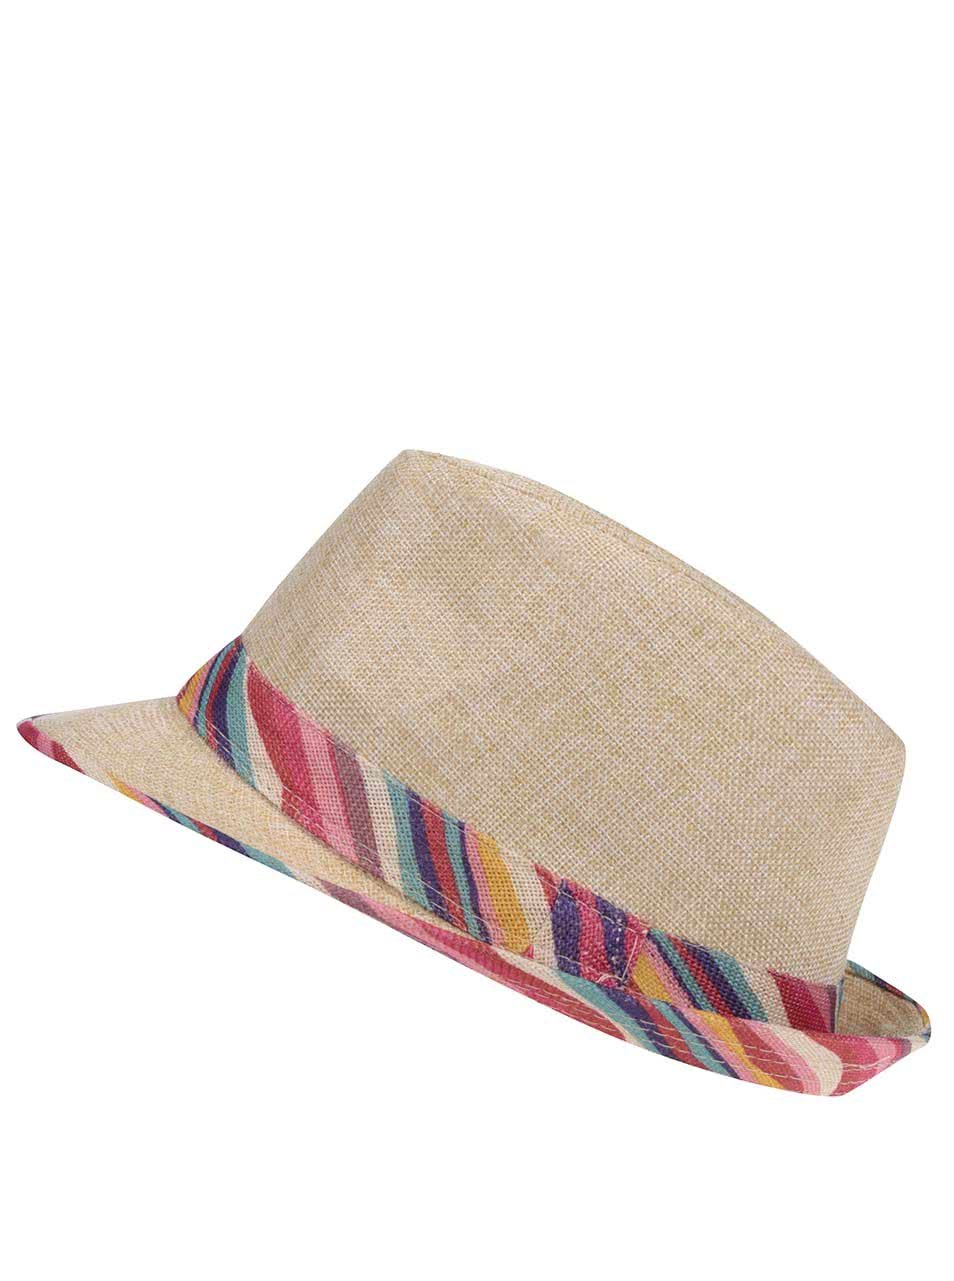 11b8e7e74 Slamený klobúk s farebnými detailmi INVUU London | ZOOT.sk